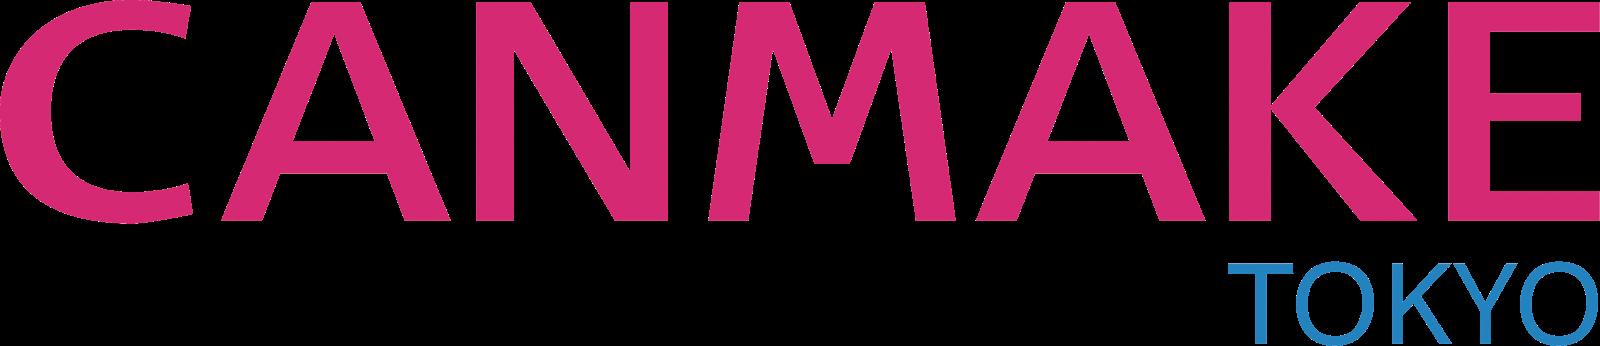 Canmake's logo